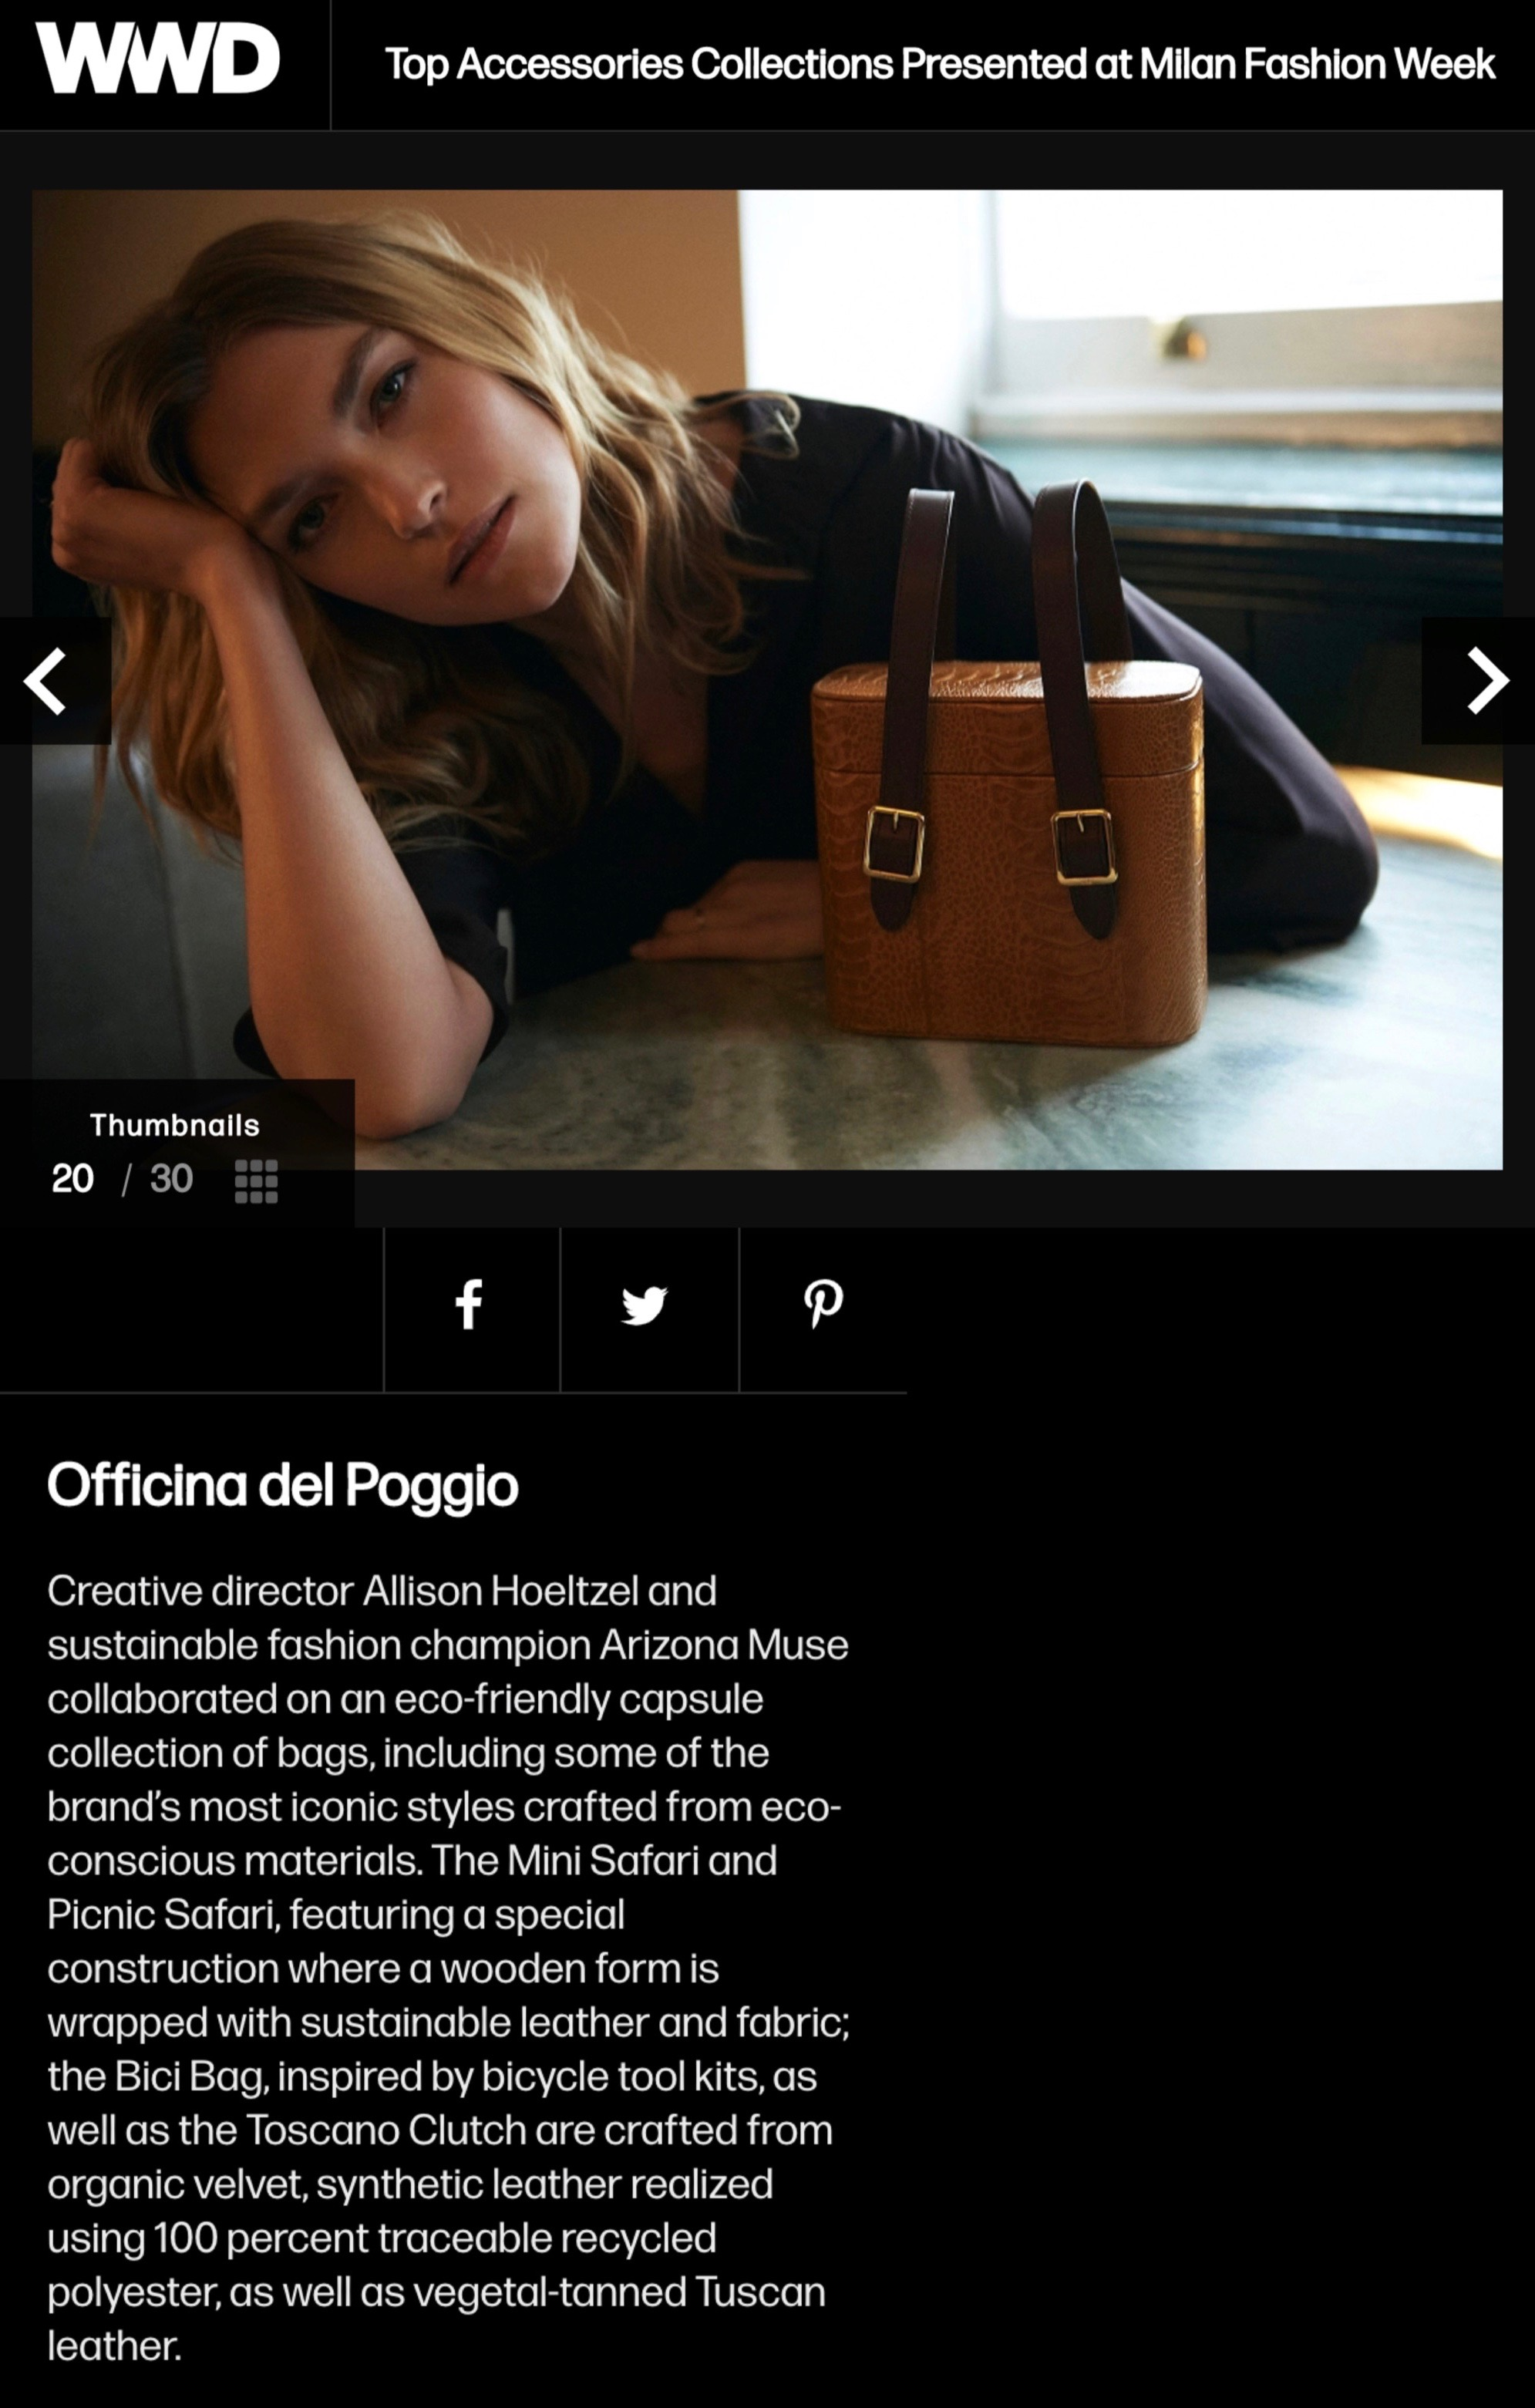 WWD_BestAccessoriesBrands_MilanFashionWeek_ODP_Officina_del_Poggio 2.jpg